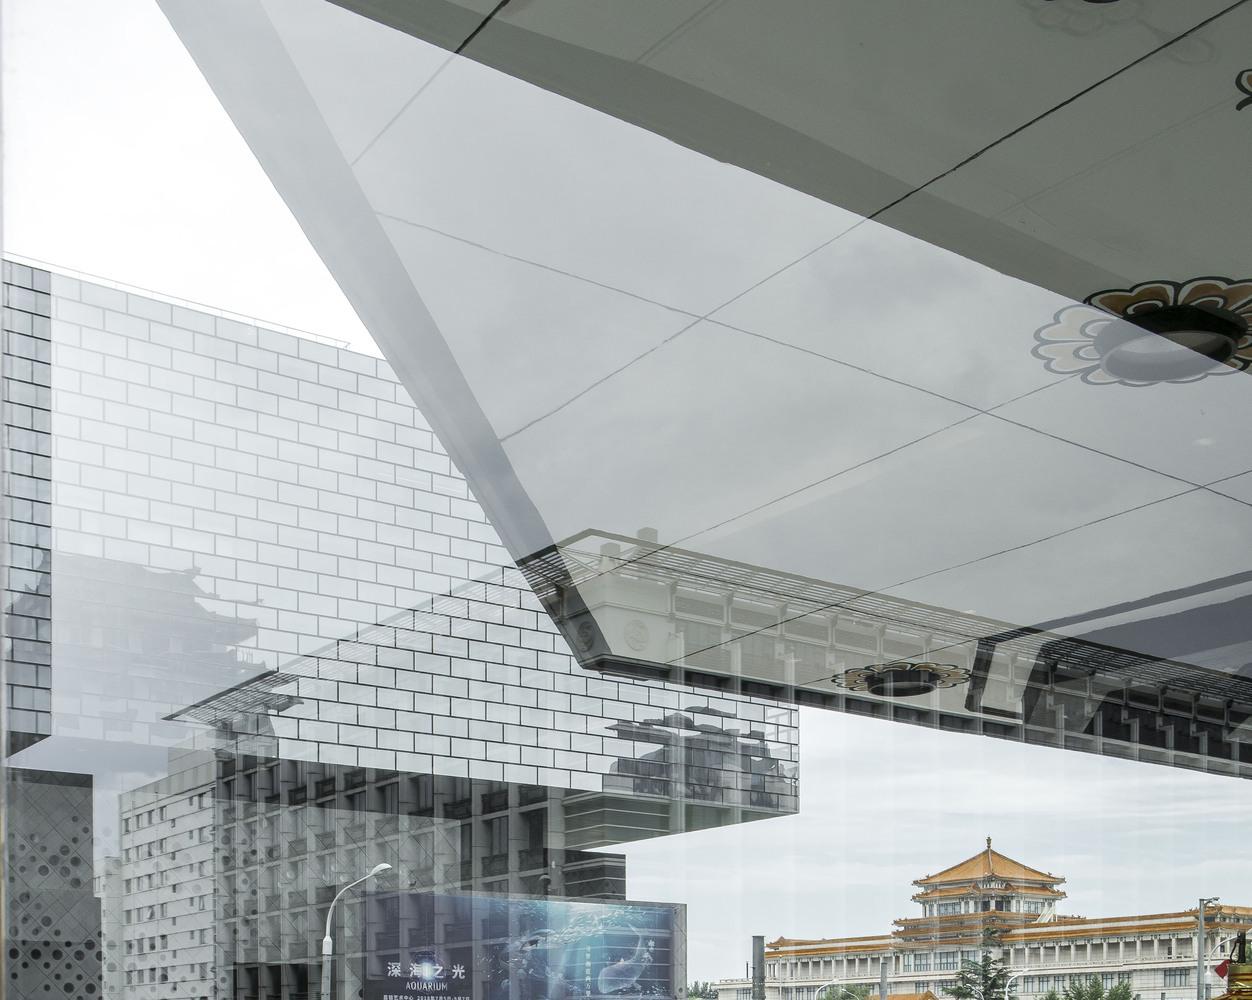 Trung tâm nghệ thuật Guardian, Bắc Kinh, Trung Quốc của Büro Ole Scheeren. Hình ảnh © Aurelien Chen